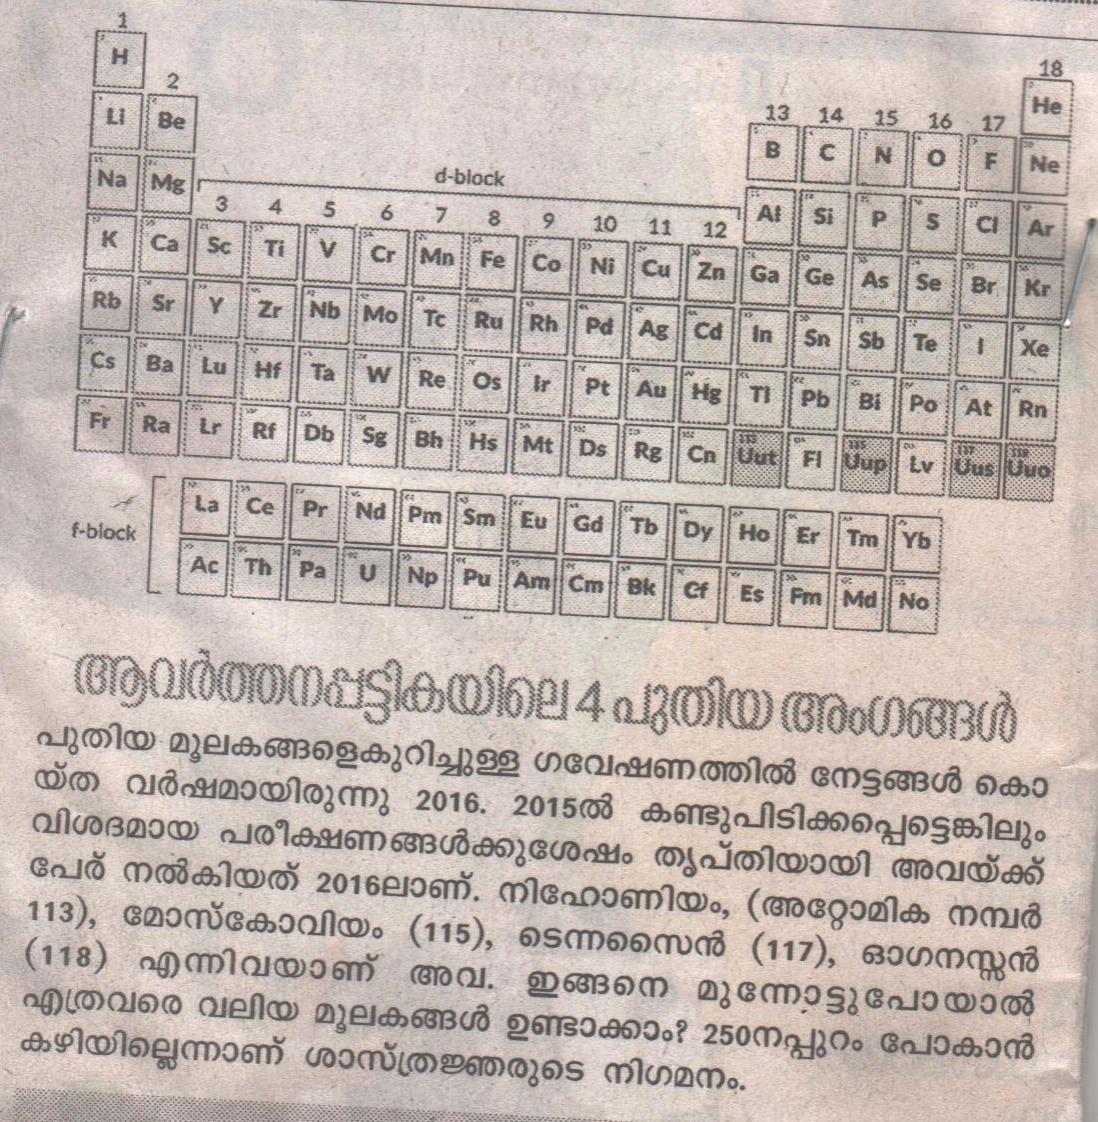 Malayalam periodic table of the elements malayalam periodic table transcription urtaz Gallery